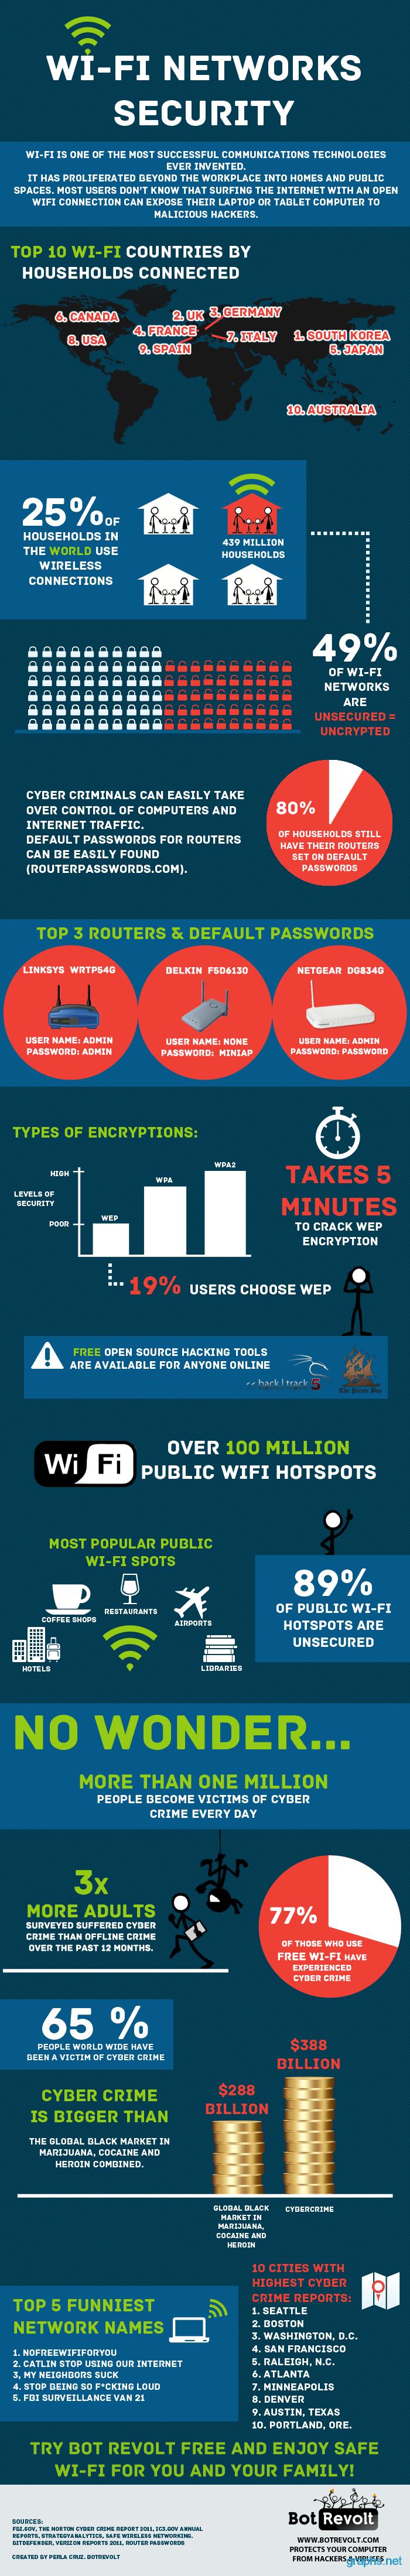 wifi network security statistics